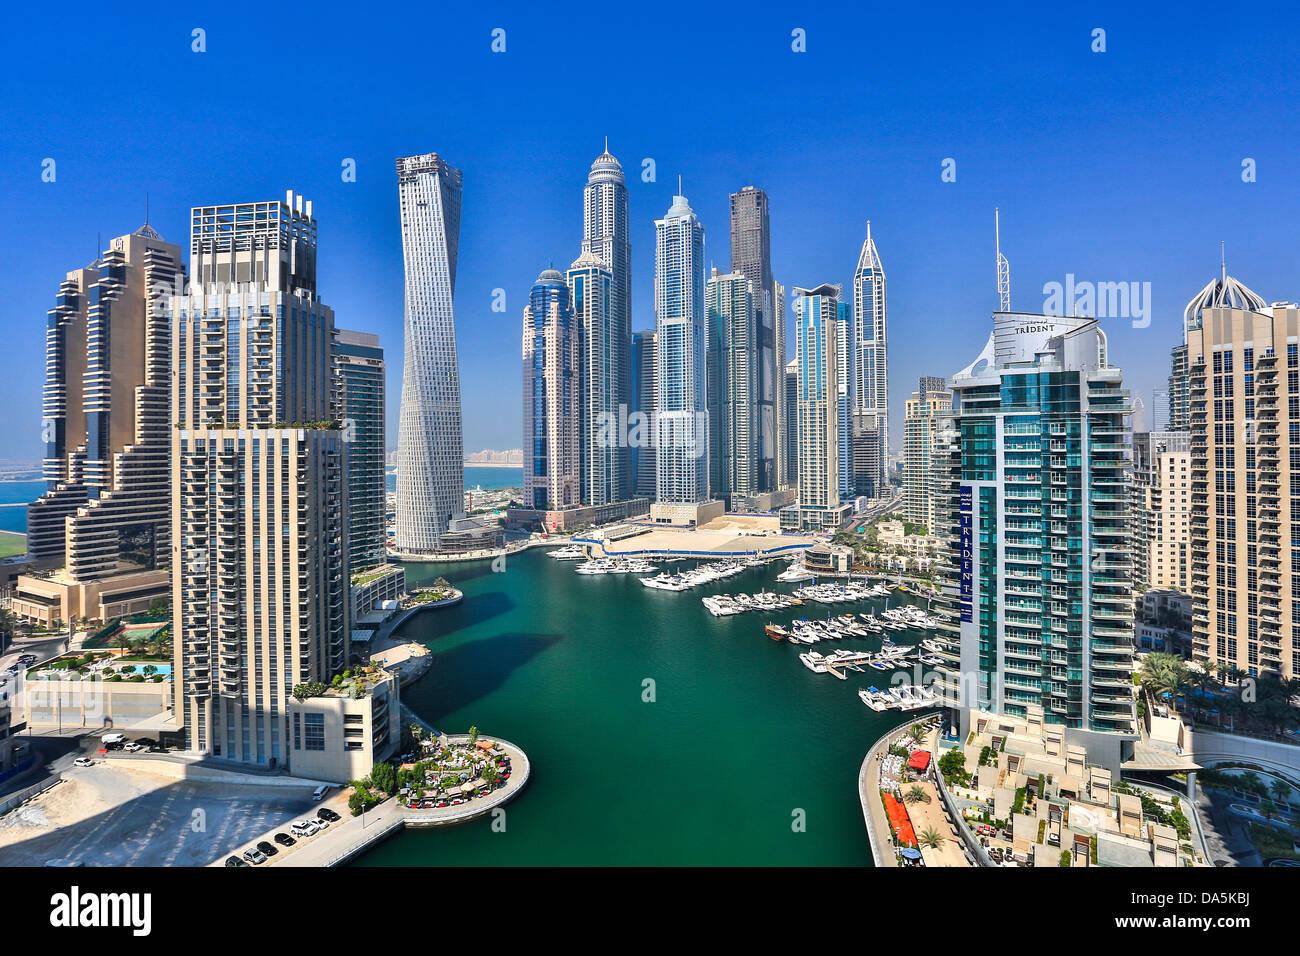 United Arab Emirates, UAE, Dubai, City, Dubai Marina, Dubai, architecture, boat, boats, buildings, construction, Stock Photo